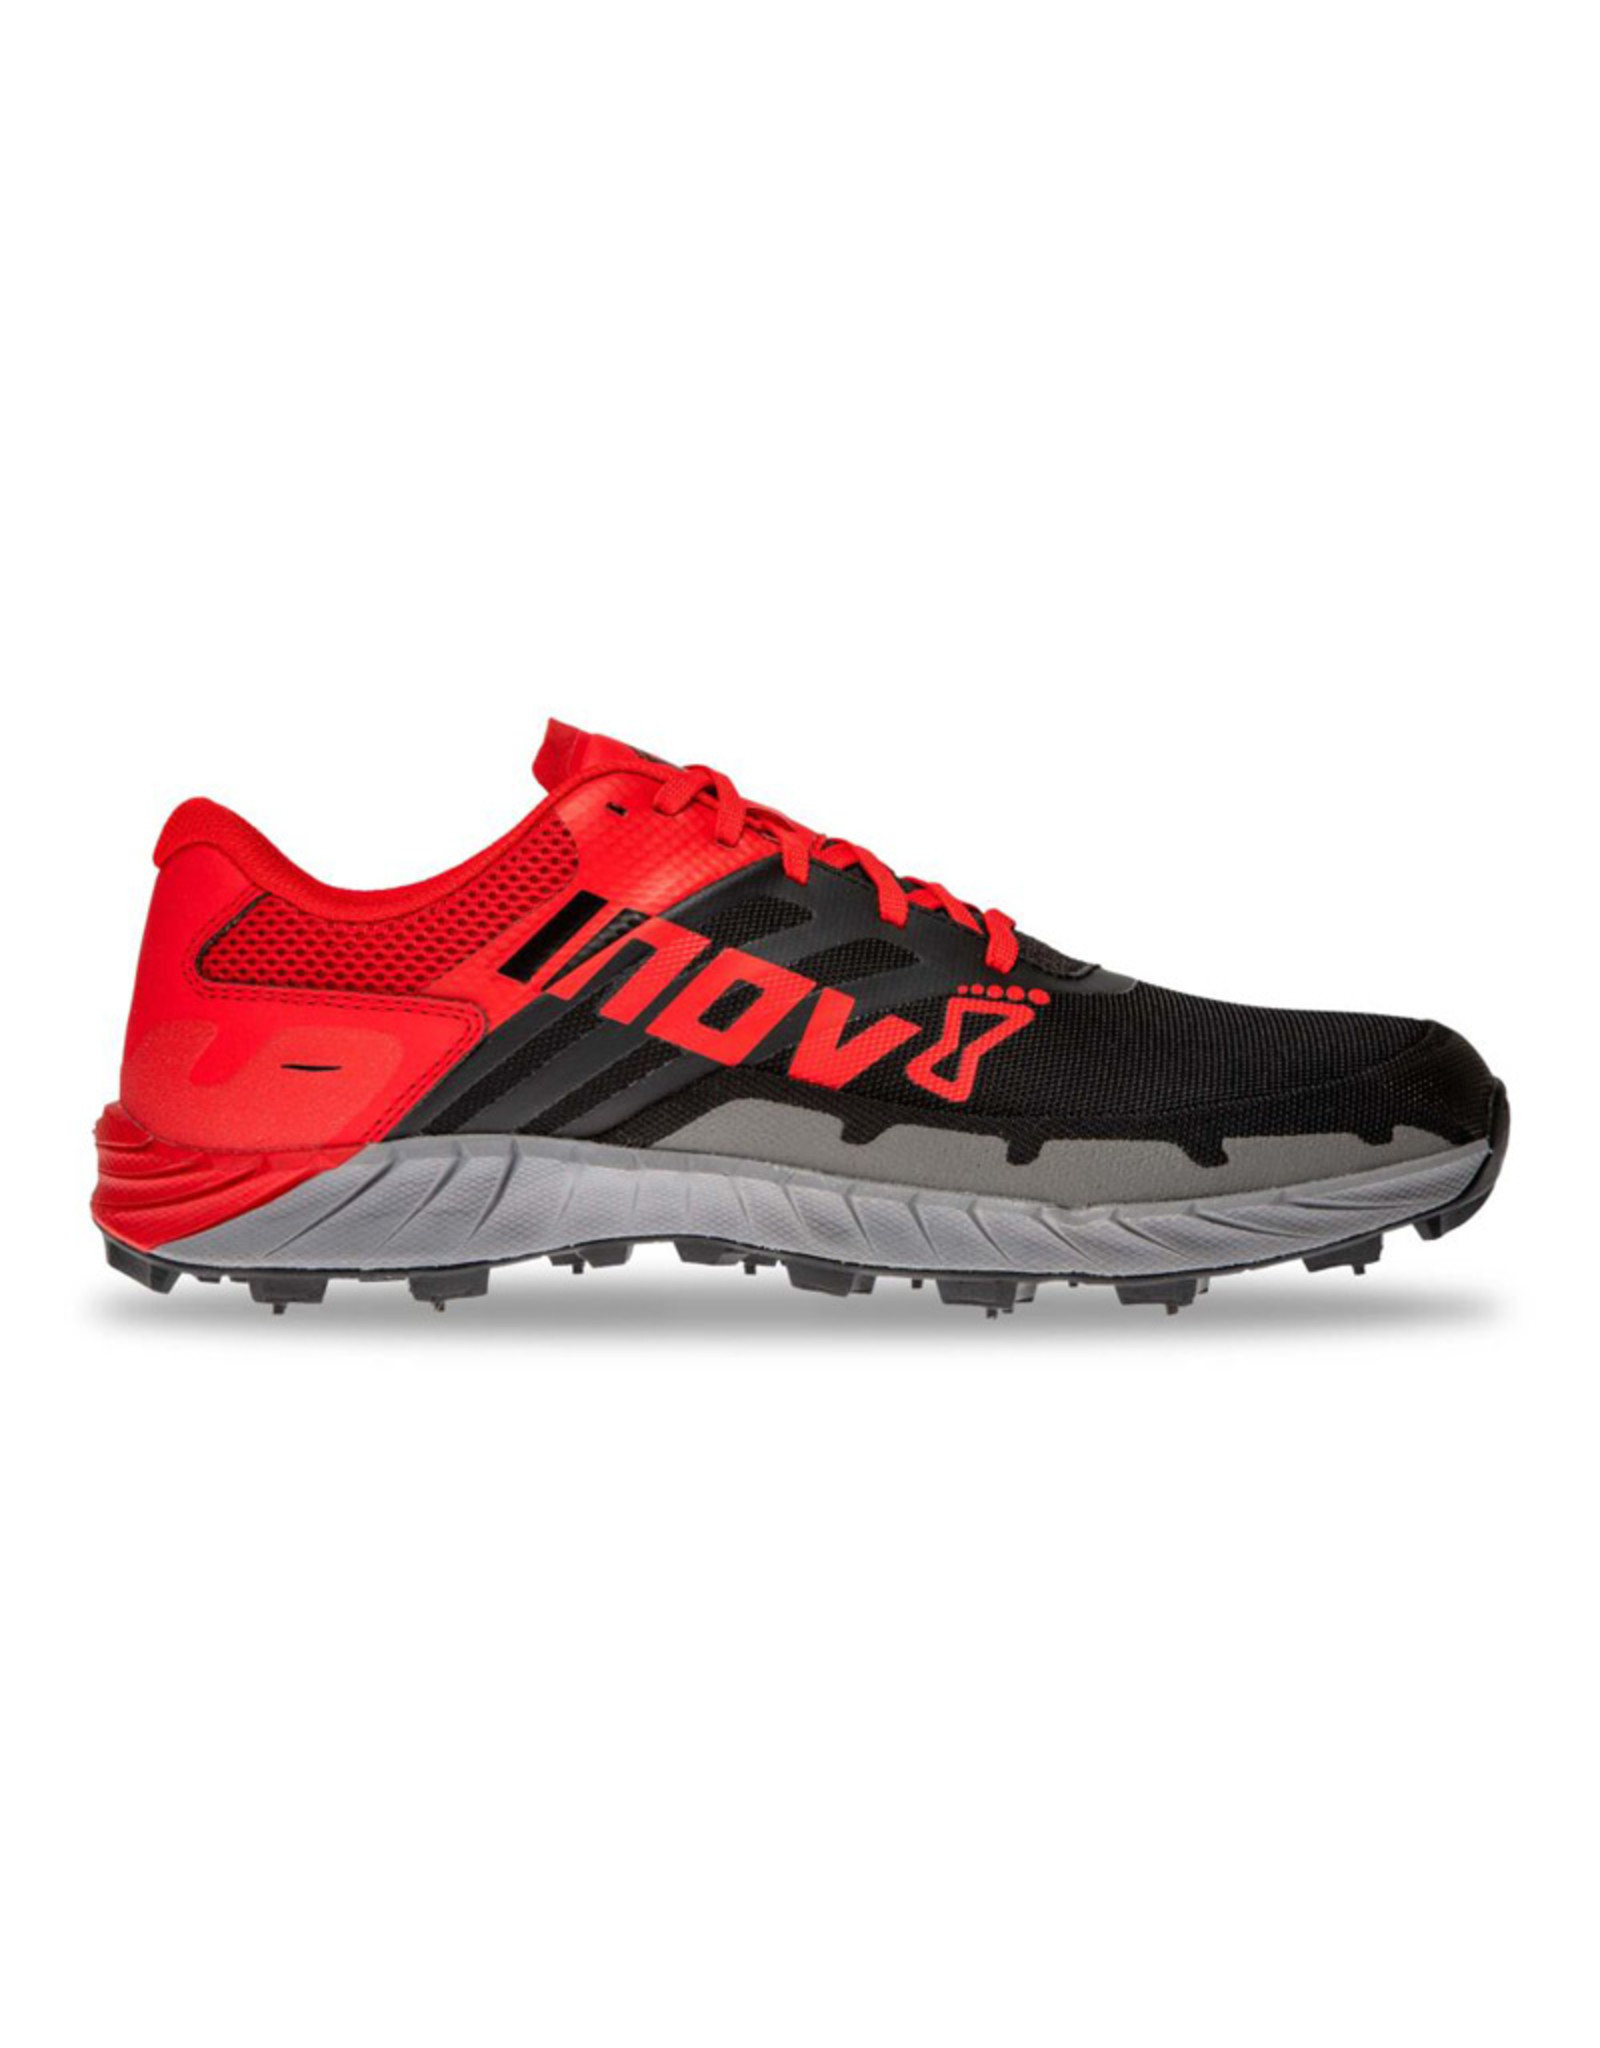 Inov-8 Oroc Ultra 290 Chaussure Cours D'Orientation - Rouge/Noir